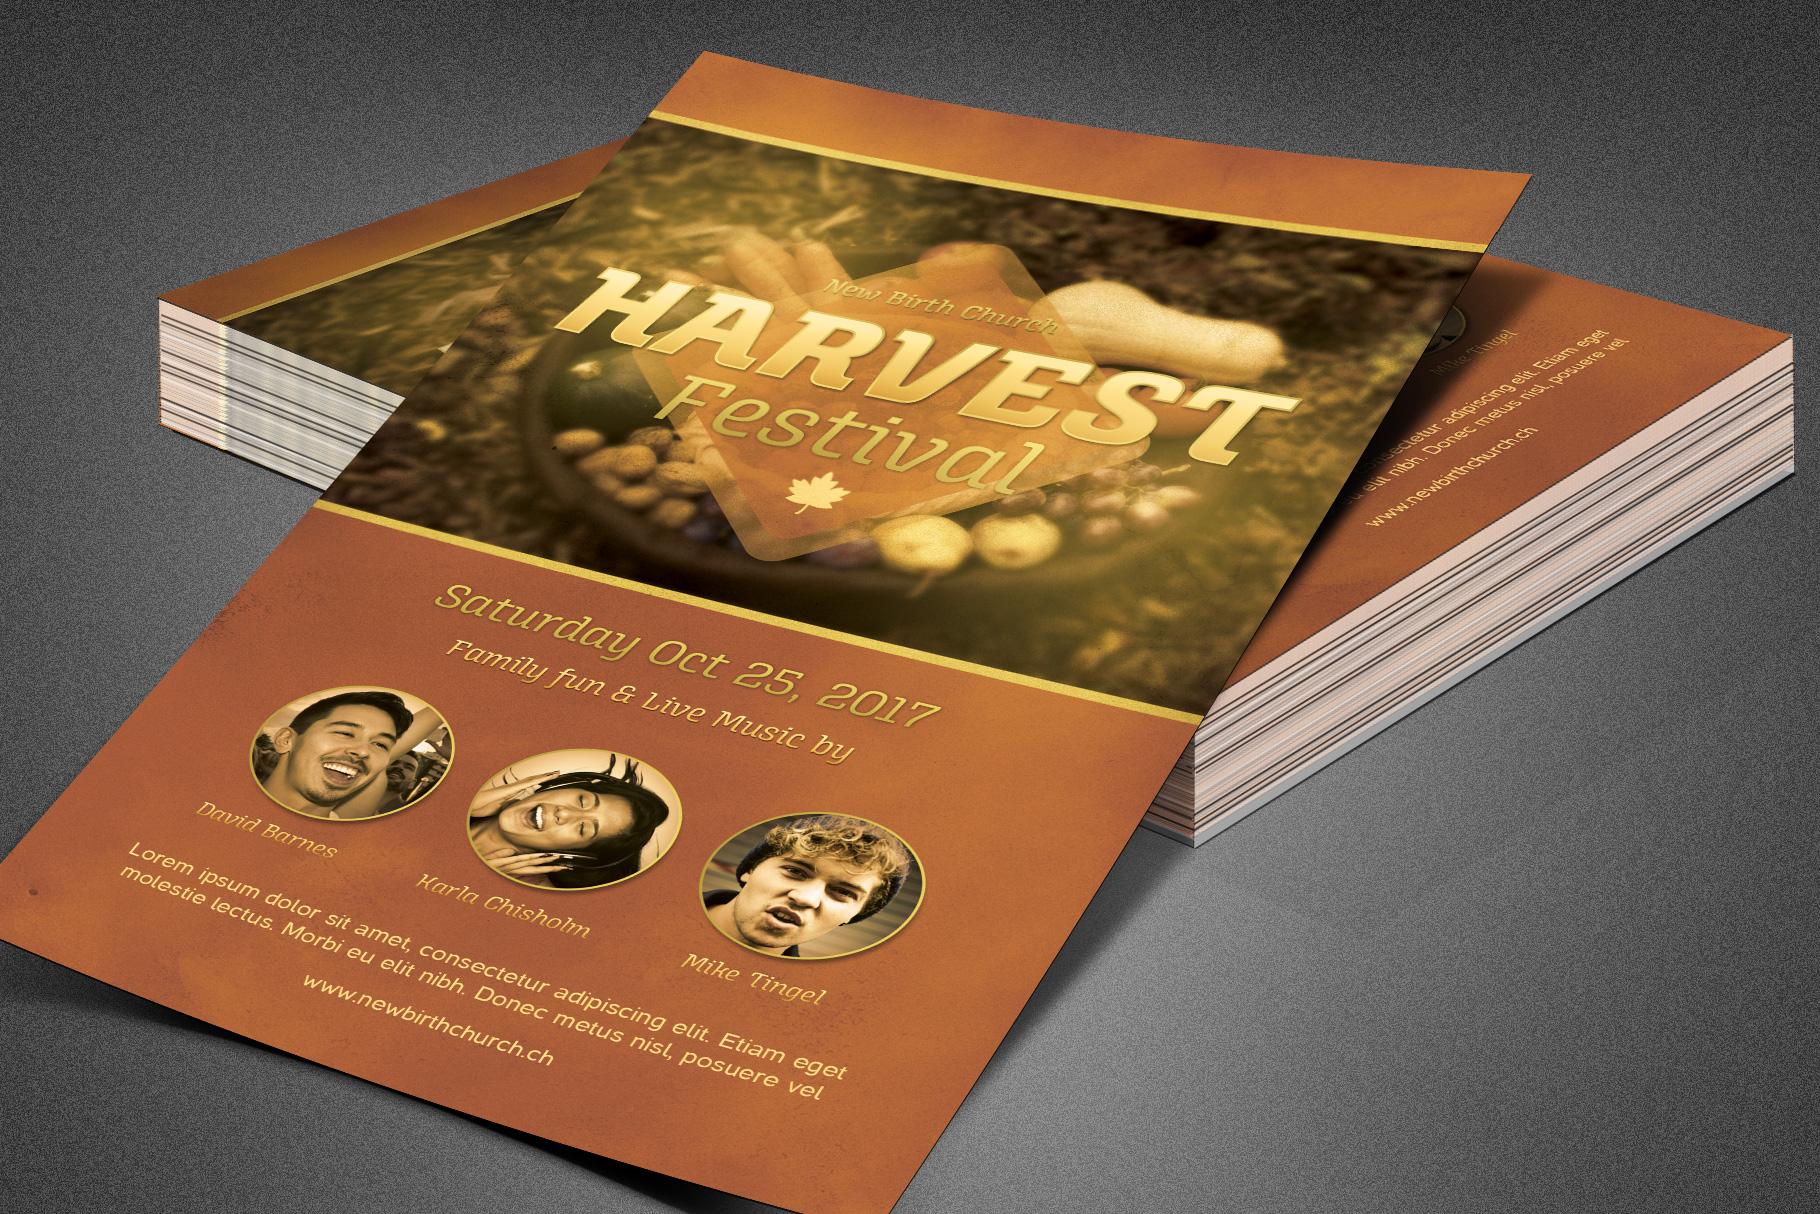 Harvest Festival Church Flyer example image 3